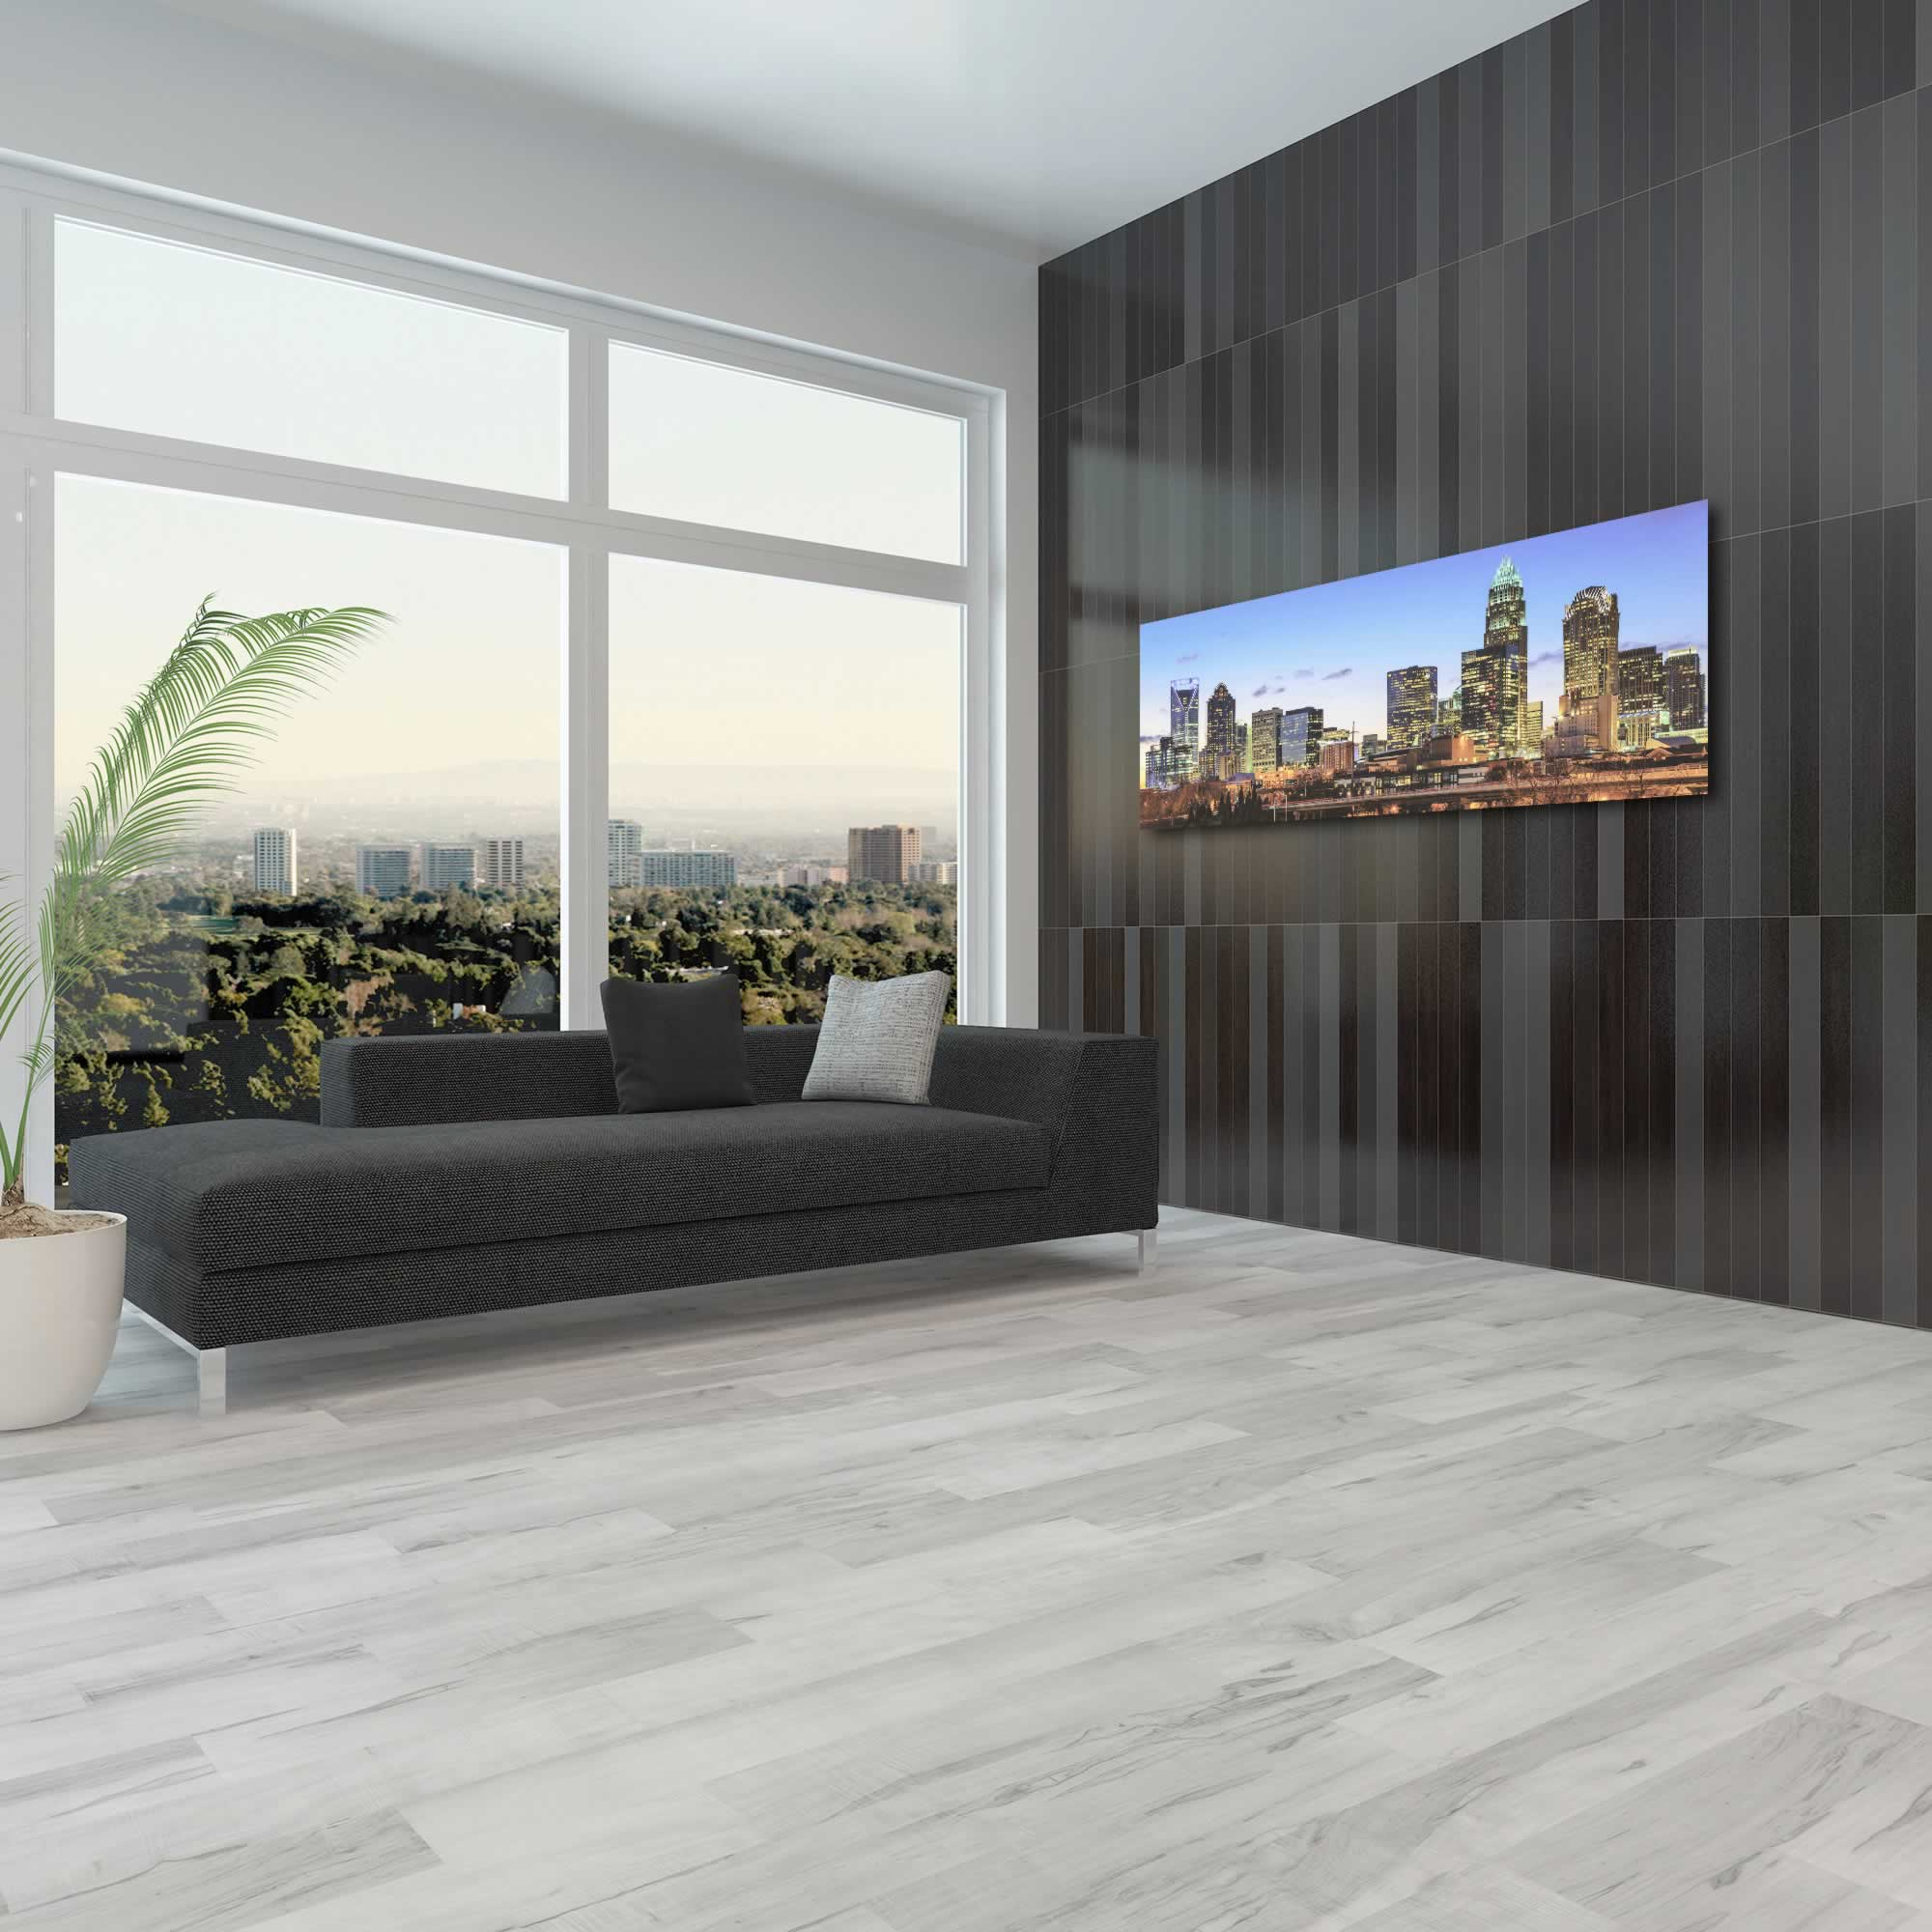 Charlotte City Skyline - Urban Modern Art, Designer Home Decor, Cityscape Wall Artwork, Trendy Contemporary Art - Alternate View 3